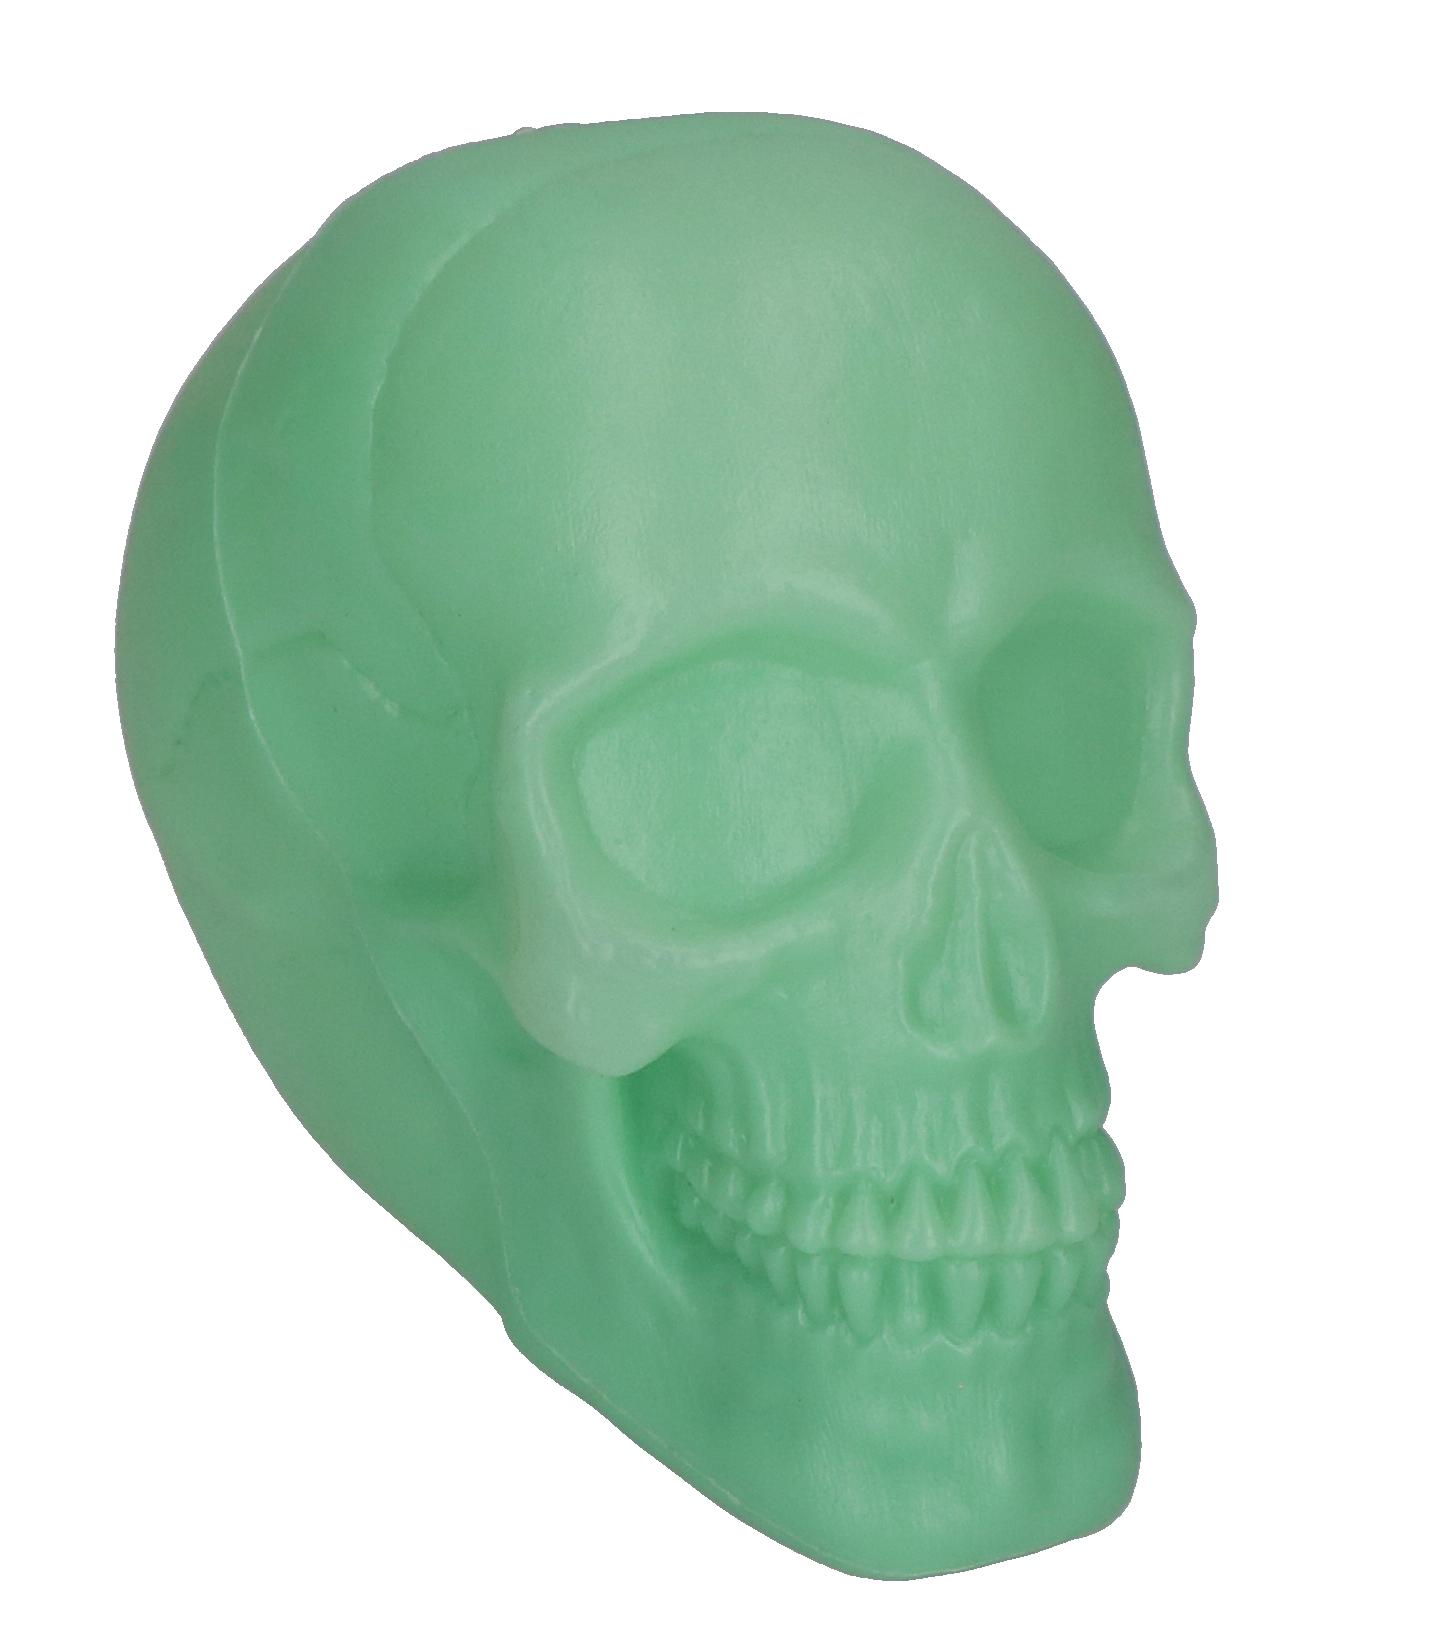 Skull glow in the dark groot